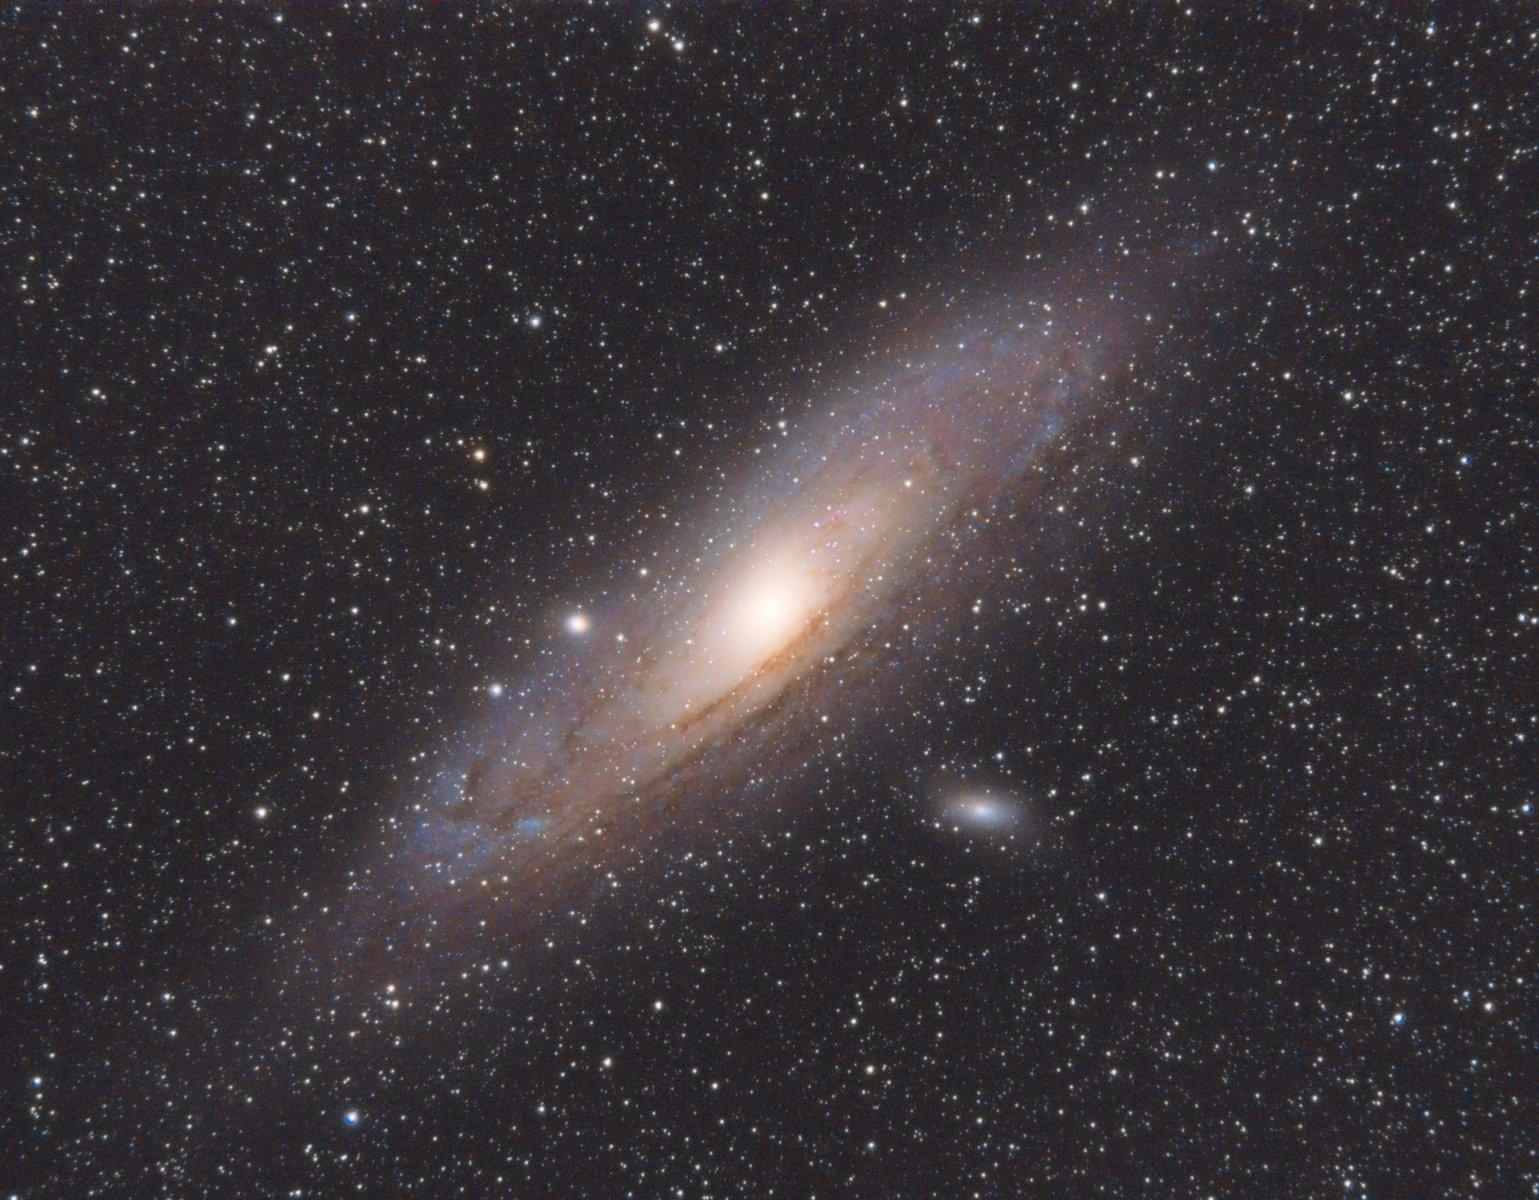 M31_Integration1_ABE4_1080.jpg